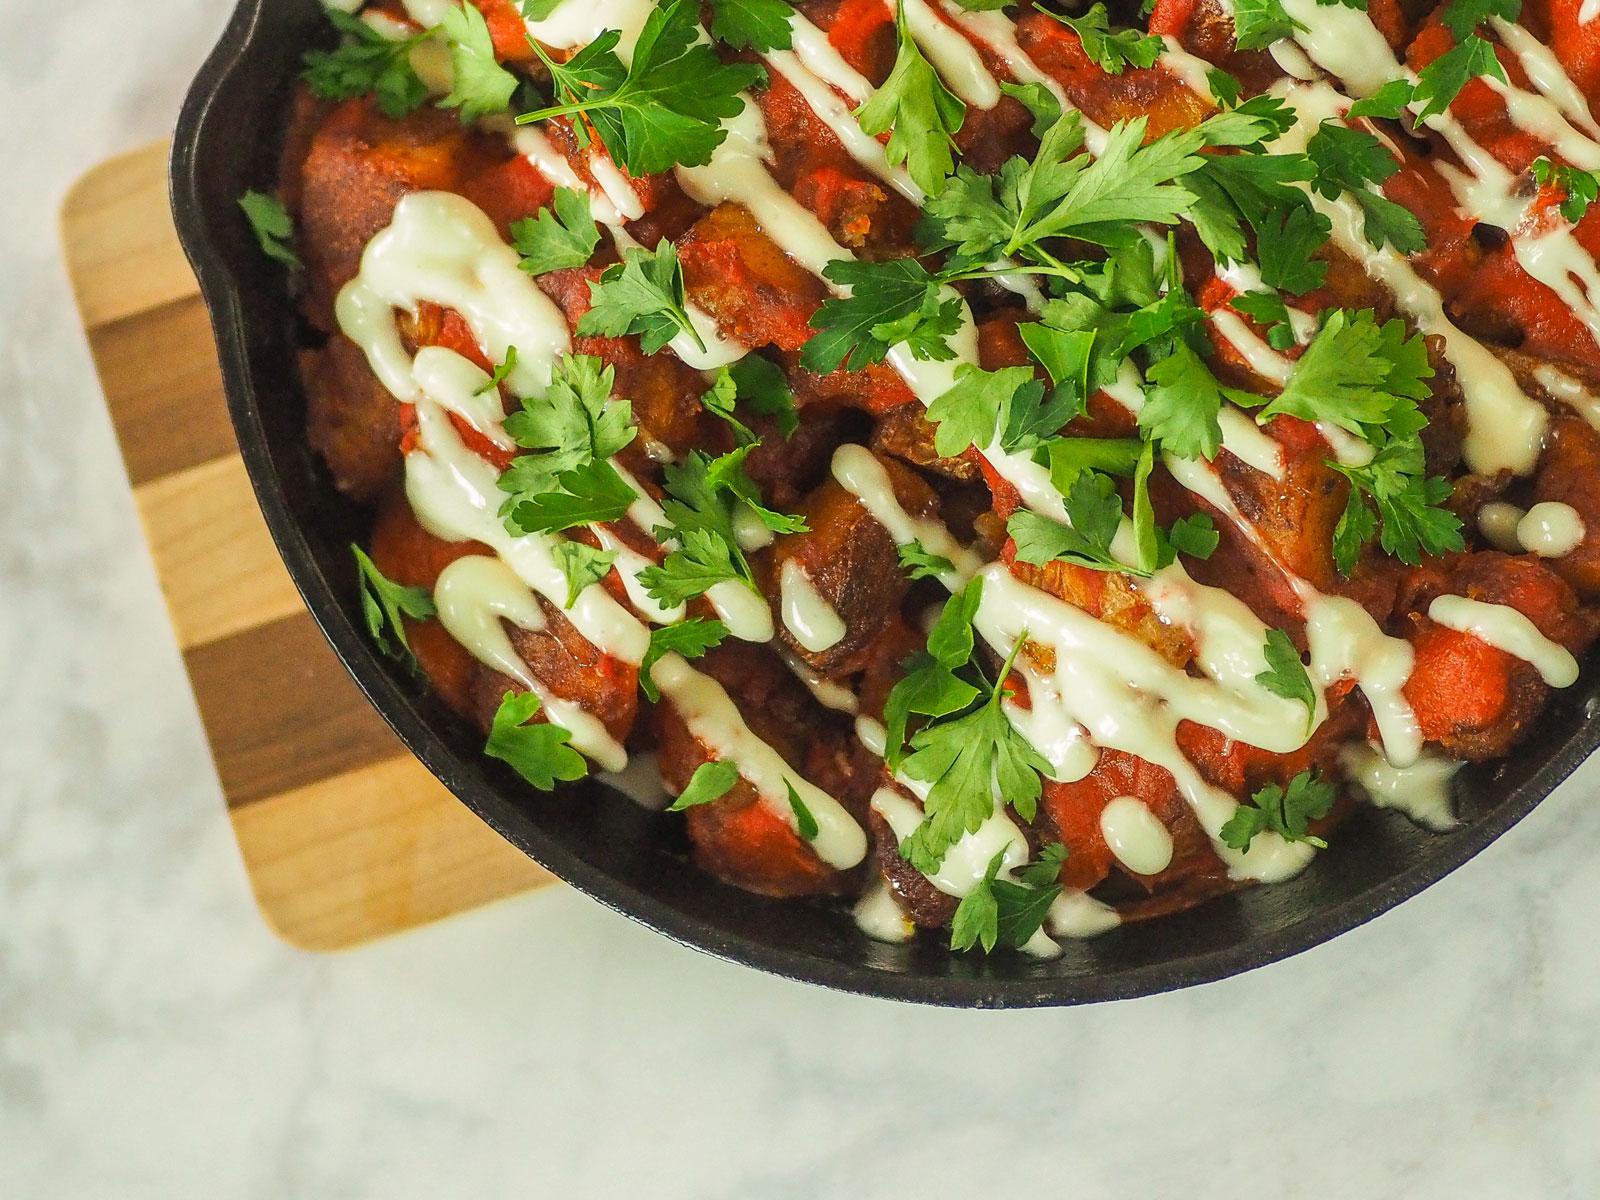 We Tried to Make España's Delicious Patatas Bravas at Home